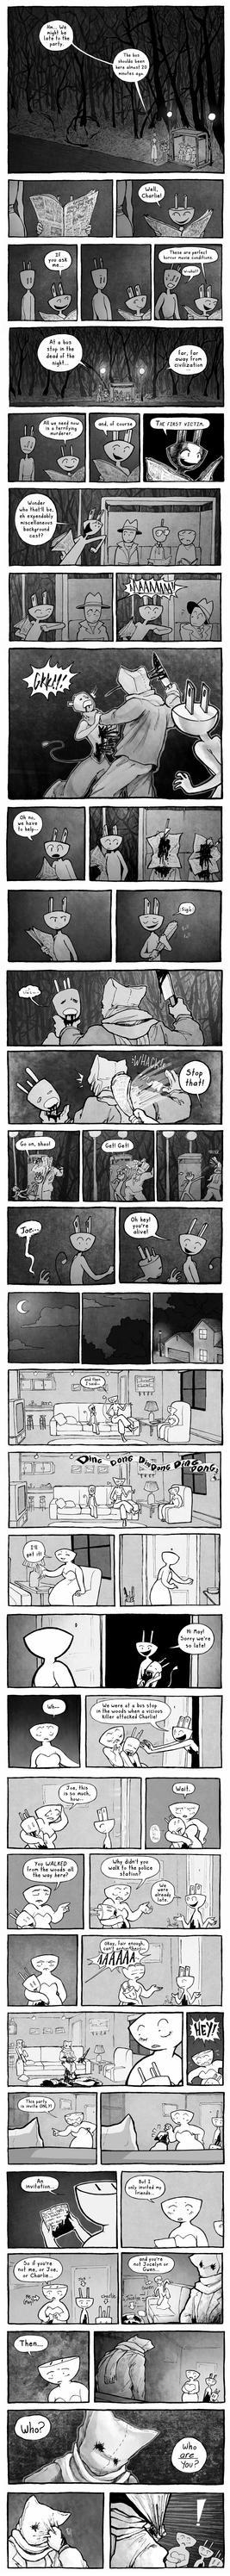 Happy Joe 3 Comic part 1 by pengosolvent